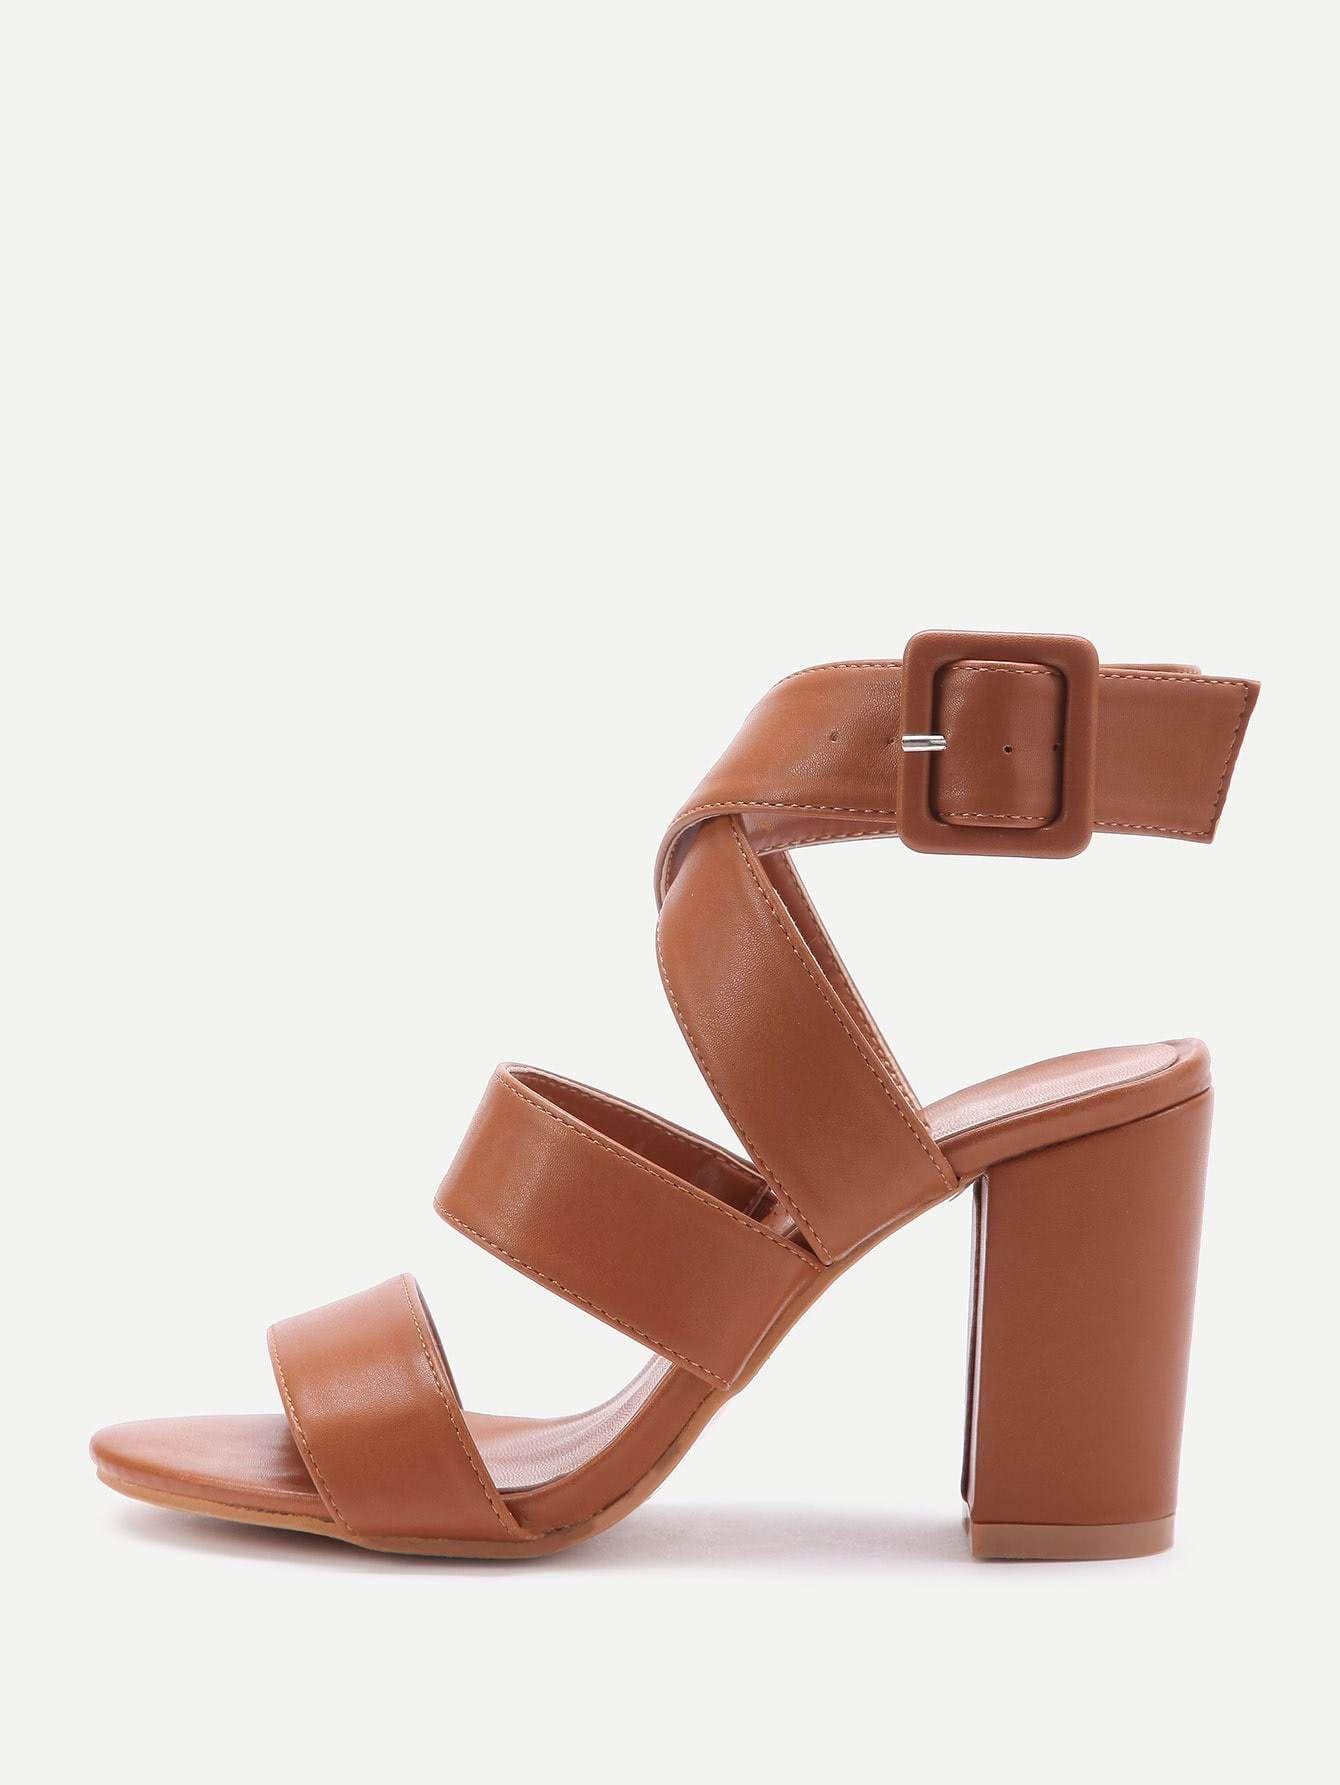 ecda220913c PU Criss Cross Block Heels With Buckle